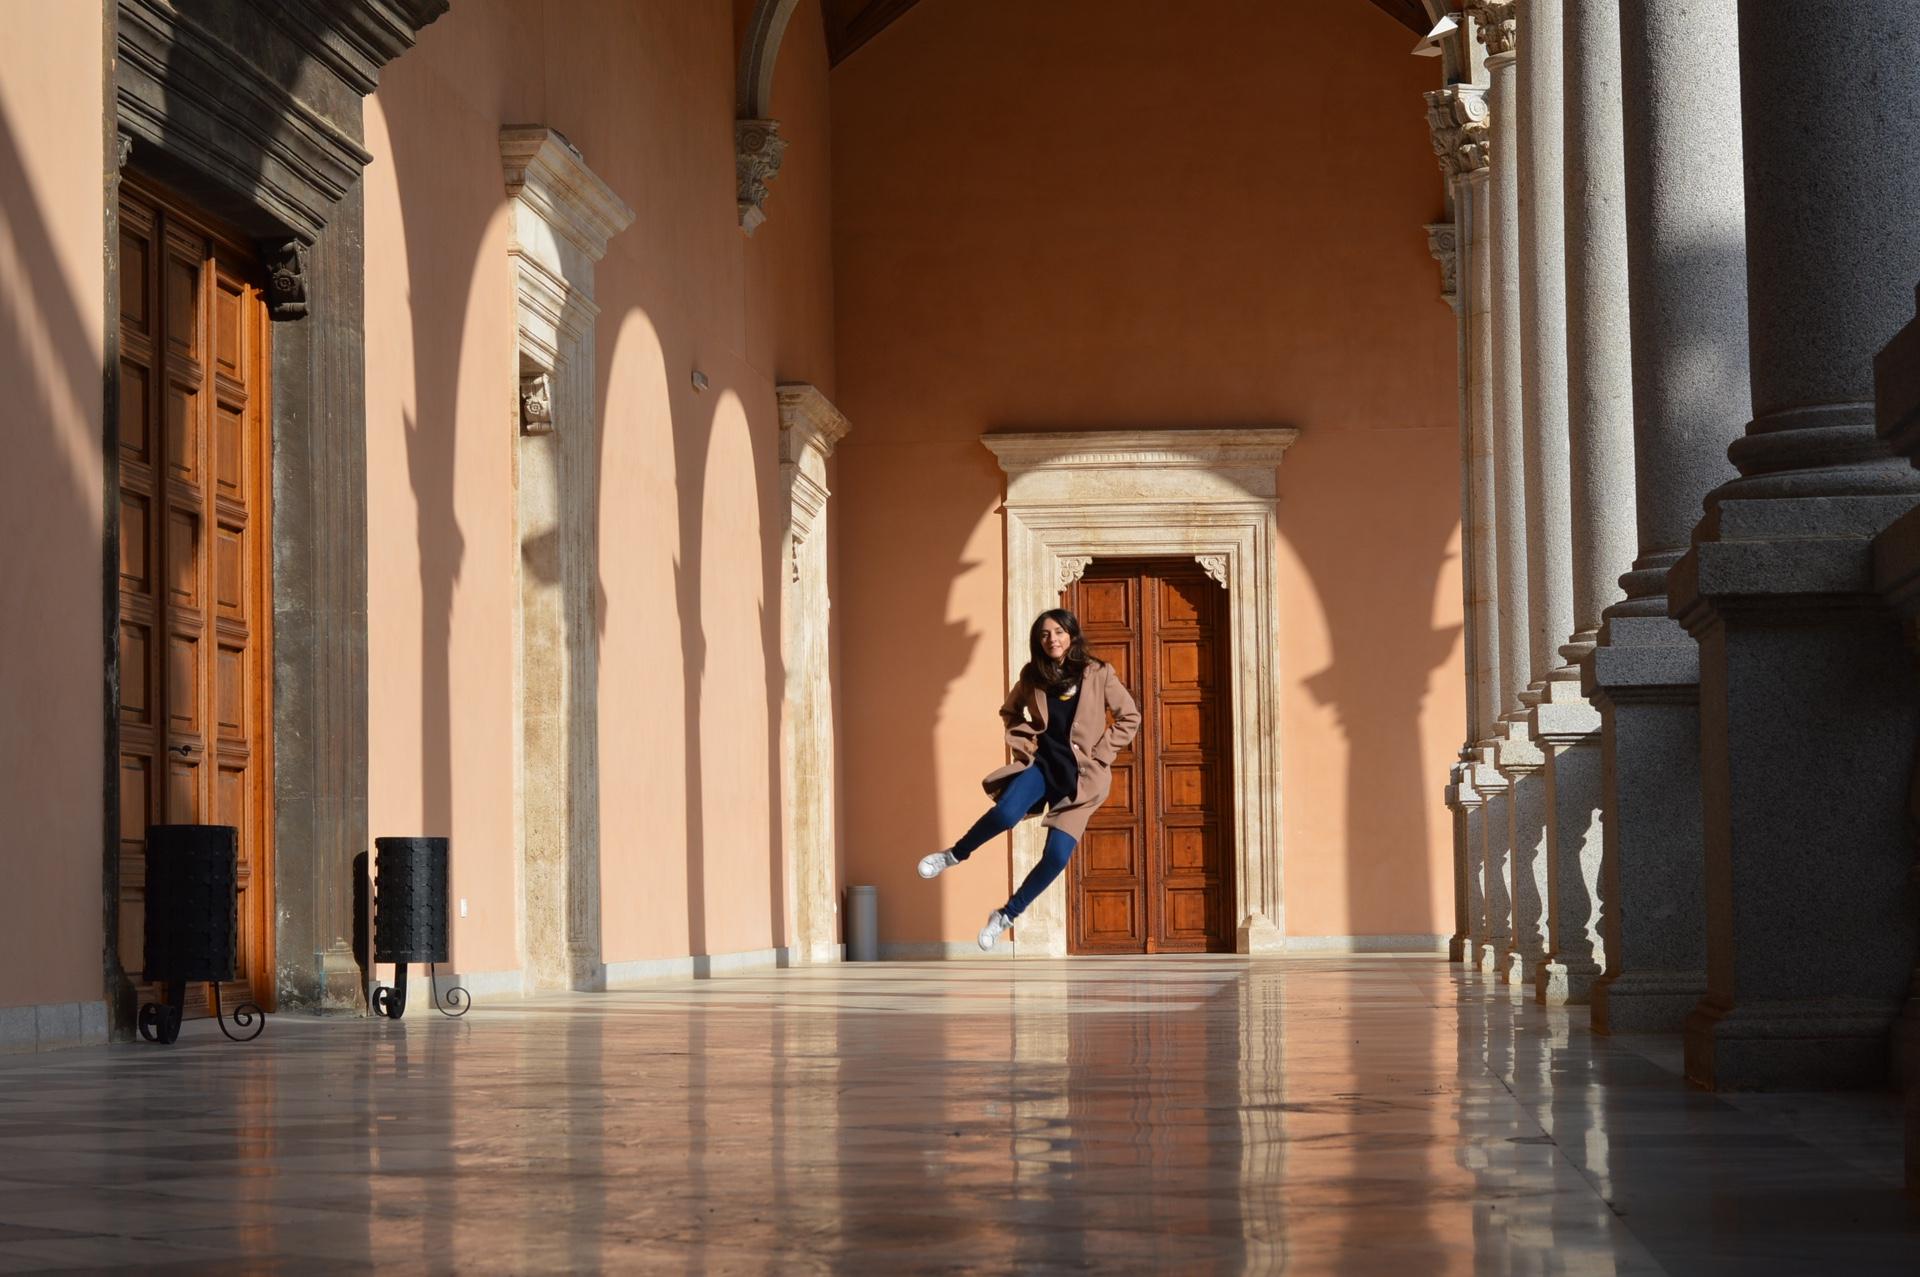 Pilar practicando el famoso salto de Carballo